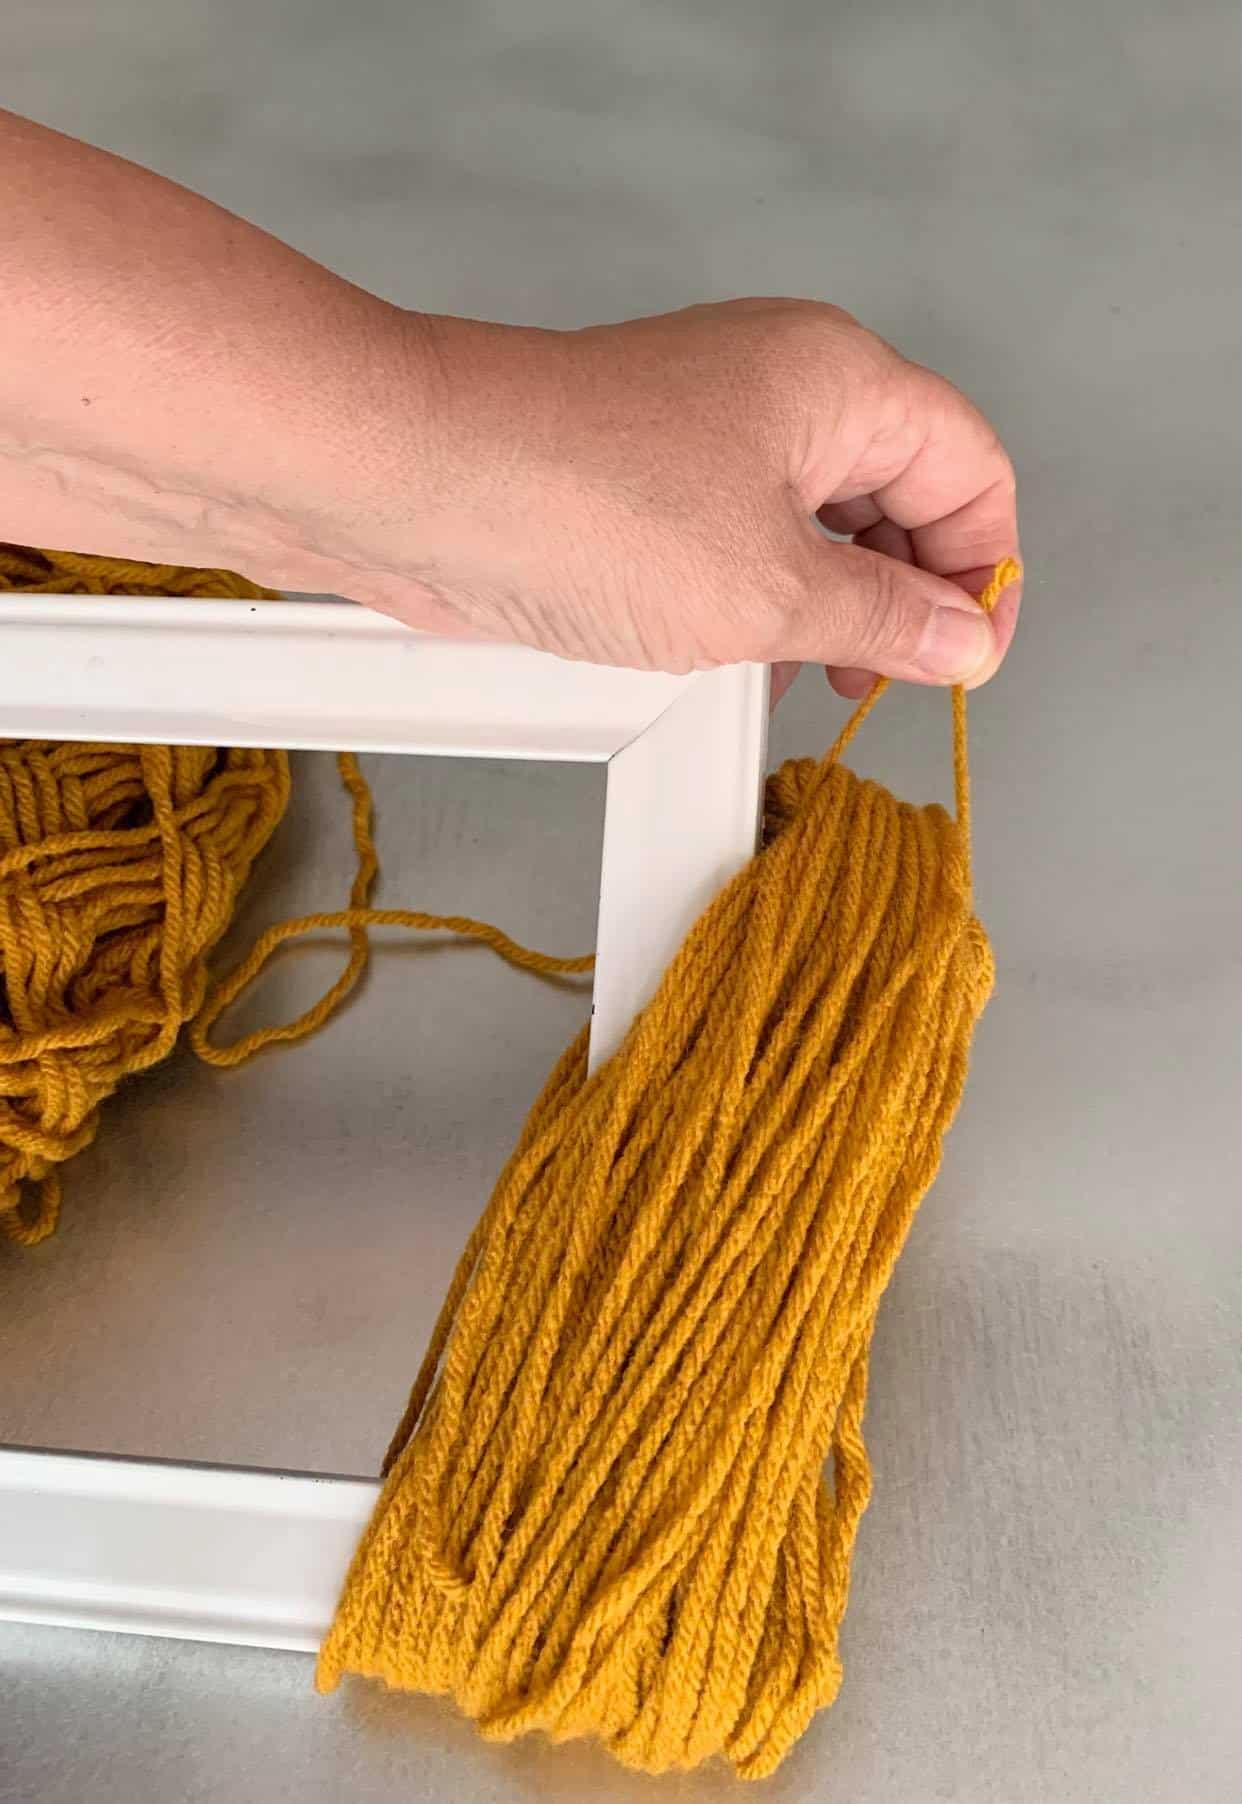 Slide the yarn off.